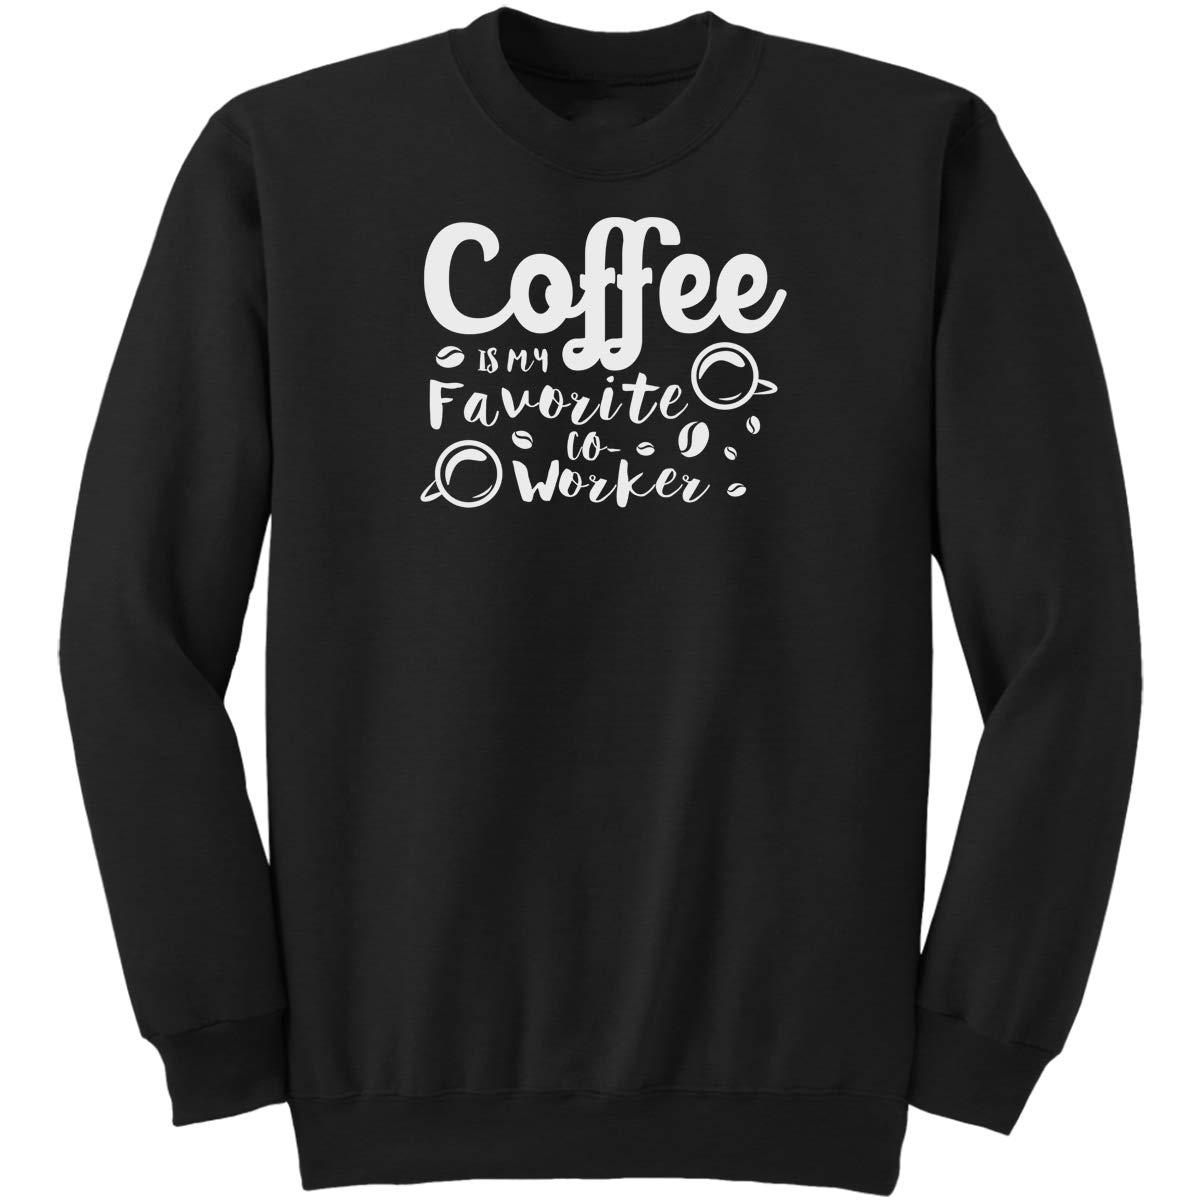 Coffee is My Favorite Co Worker Funny G Sweatshirt